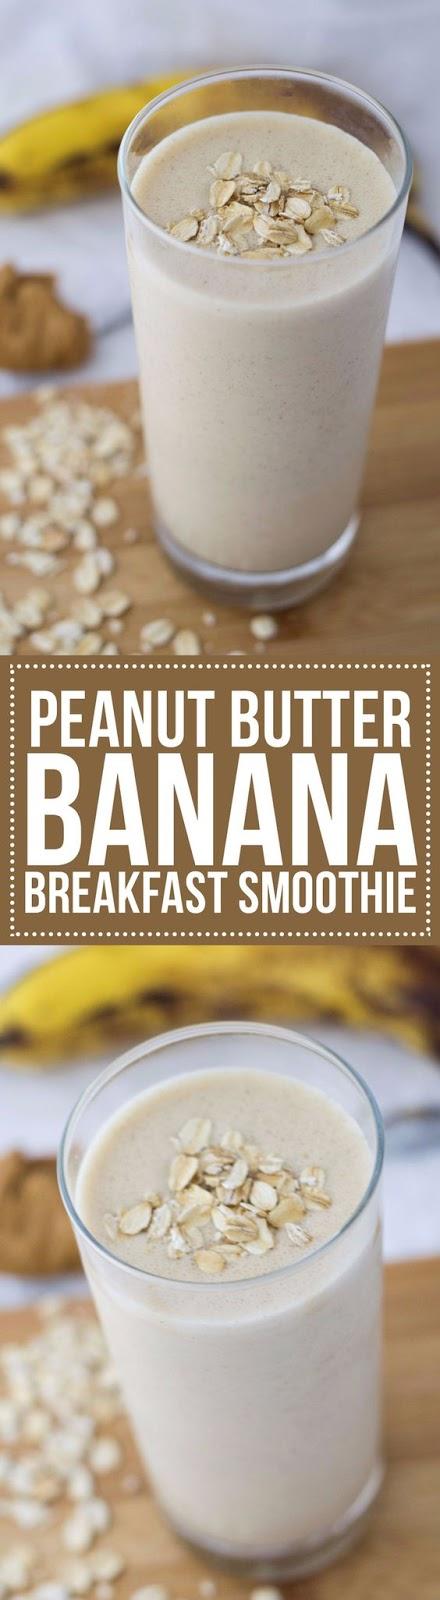 Peanut Butter Banana Breakfast Smoothie